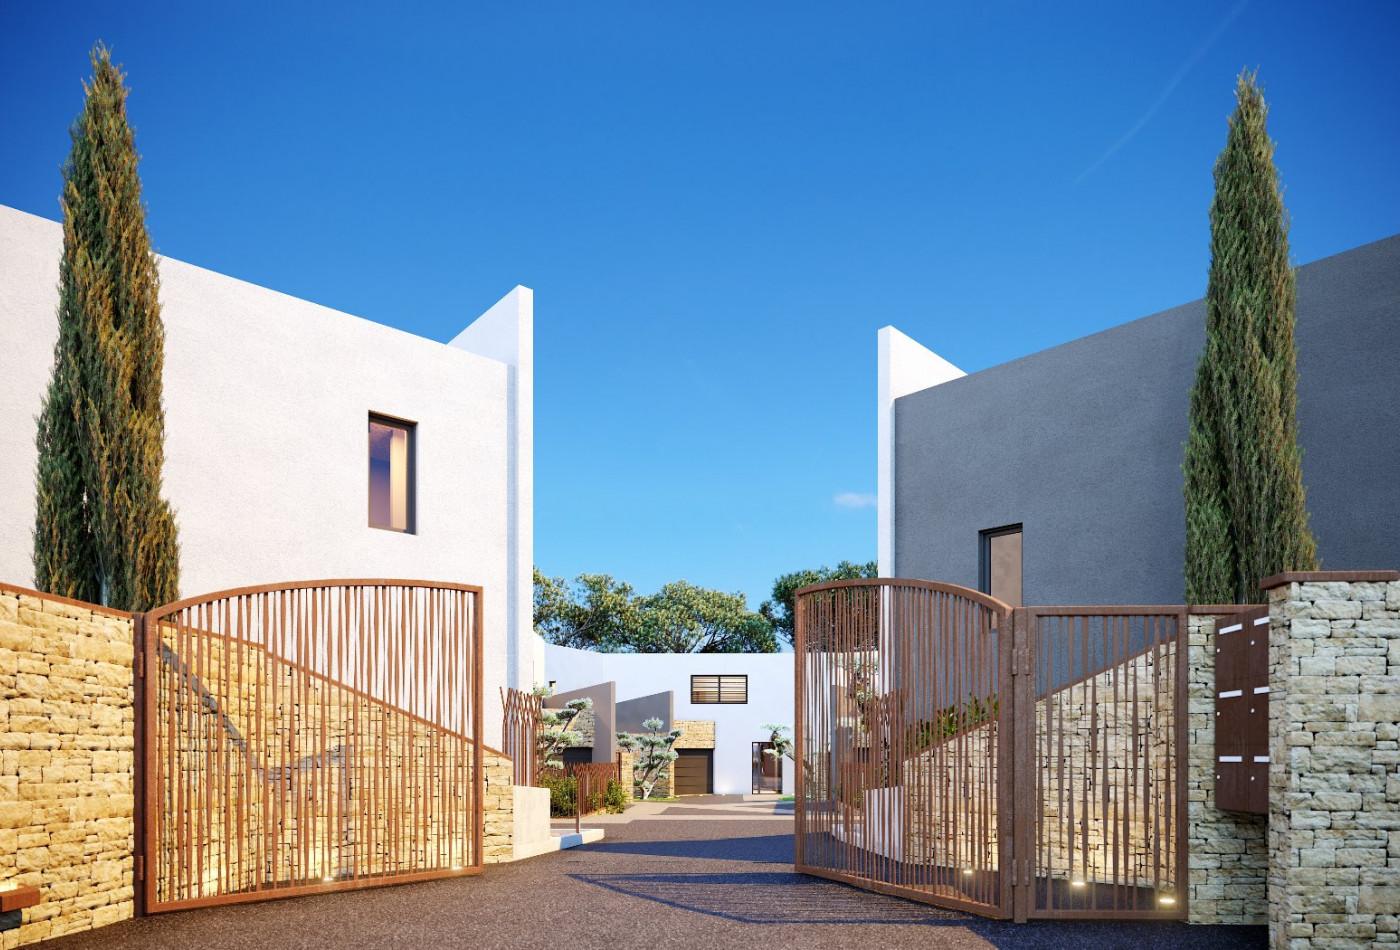 A vendre  Montpellier | Réf 340148730 - Agence galerie casanova